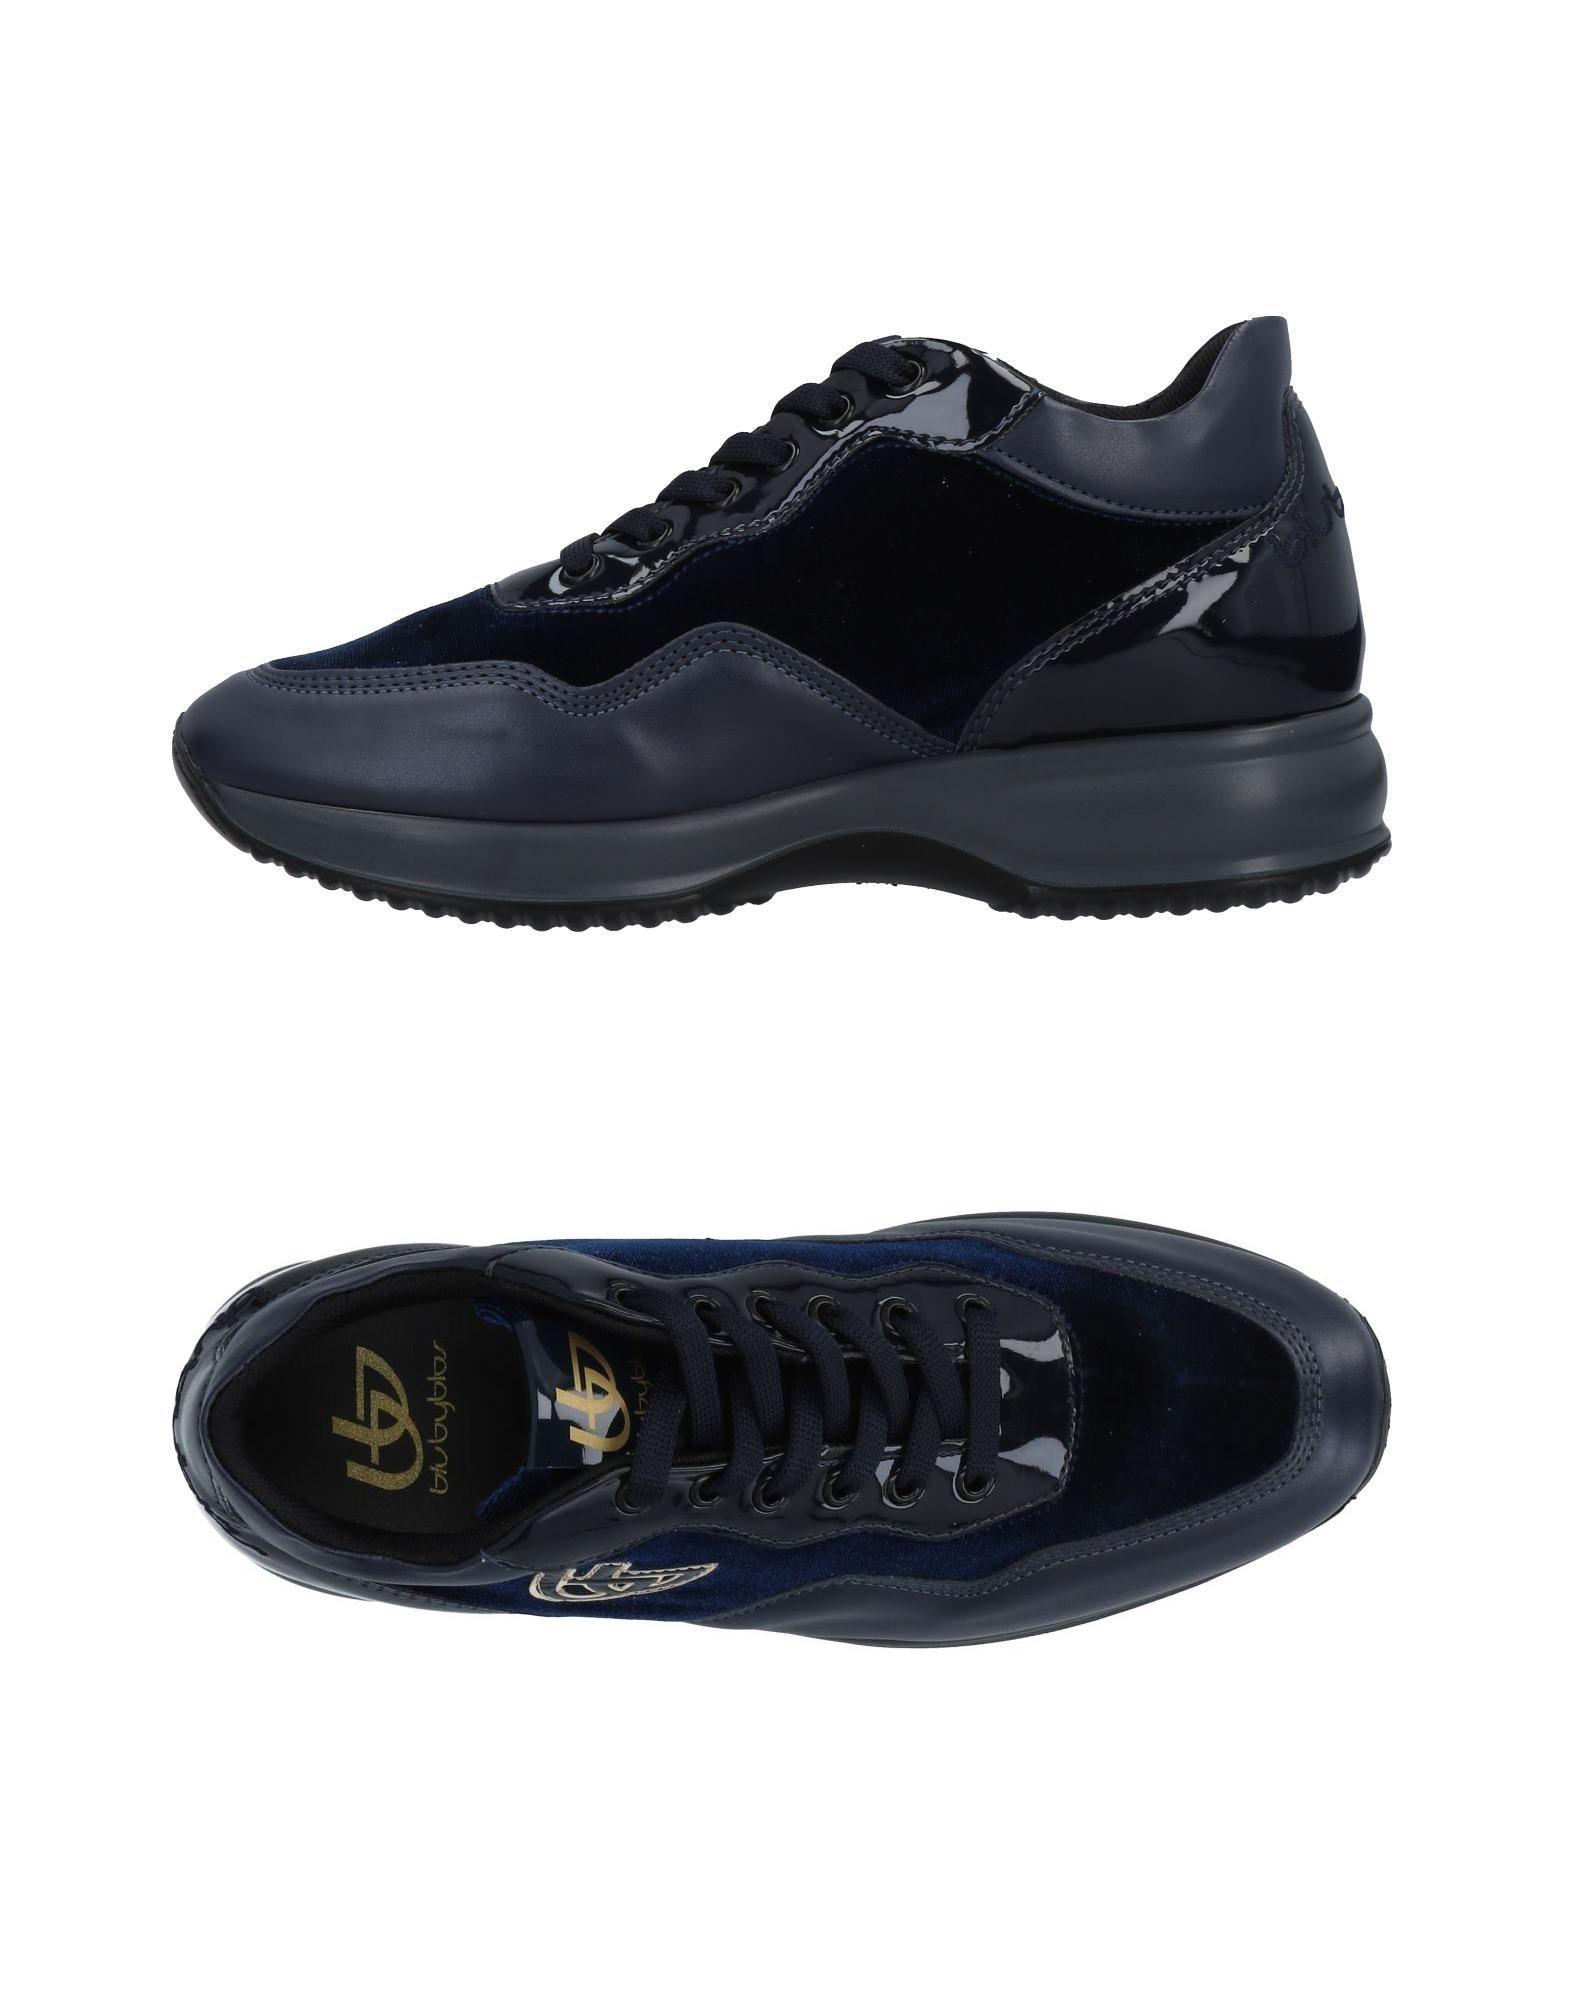 Blu Byblos Sneakers Damen  11494583EA Gute Qualität beliebte Schuhe